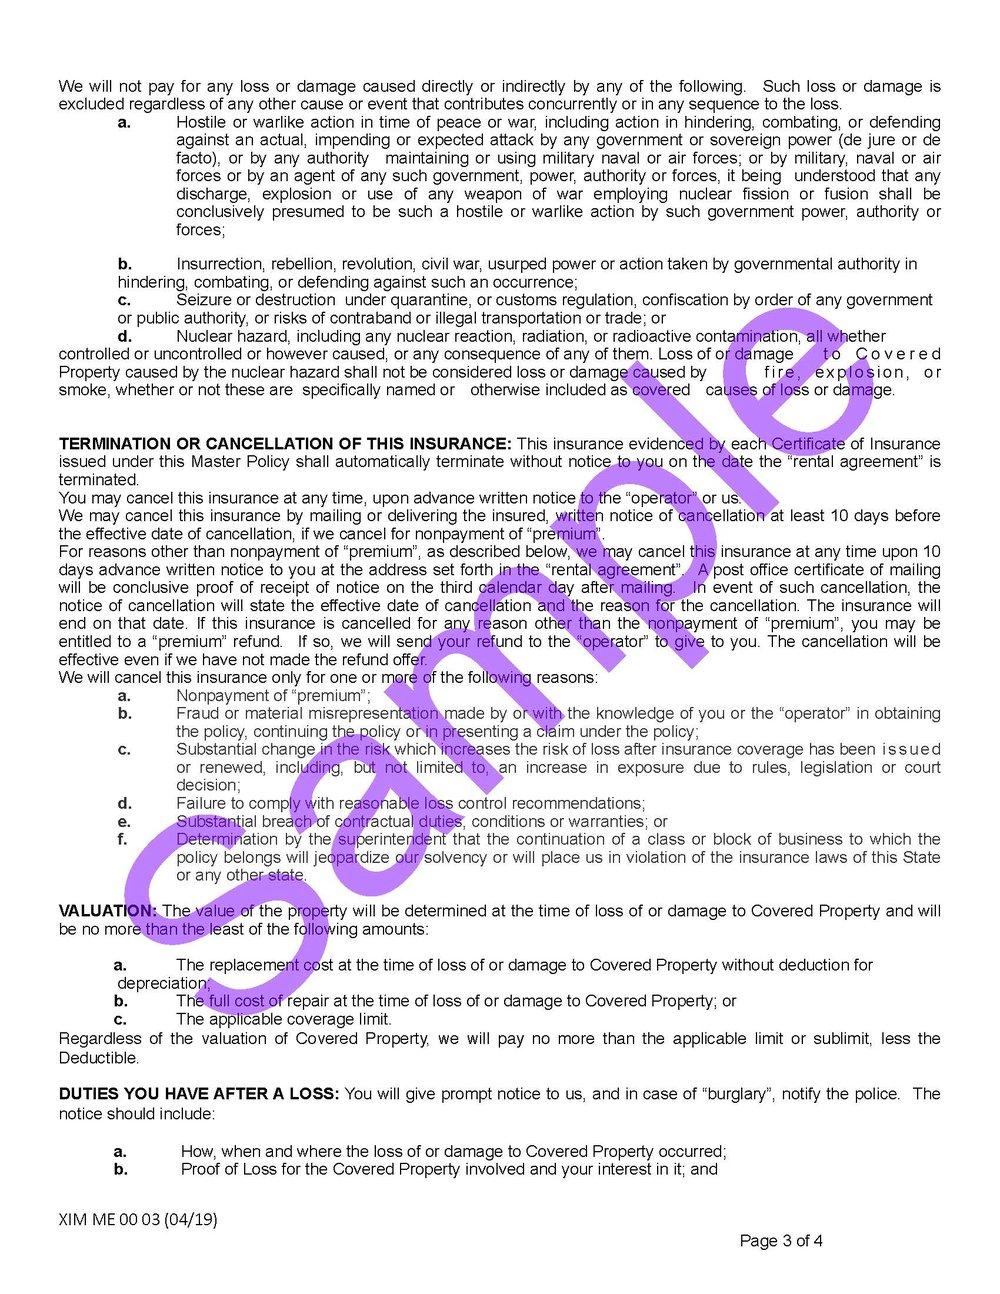 XIM ME 00 03 04 19 Maine Certificate of InsuranceSample_Page_3.jpg